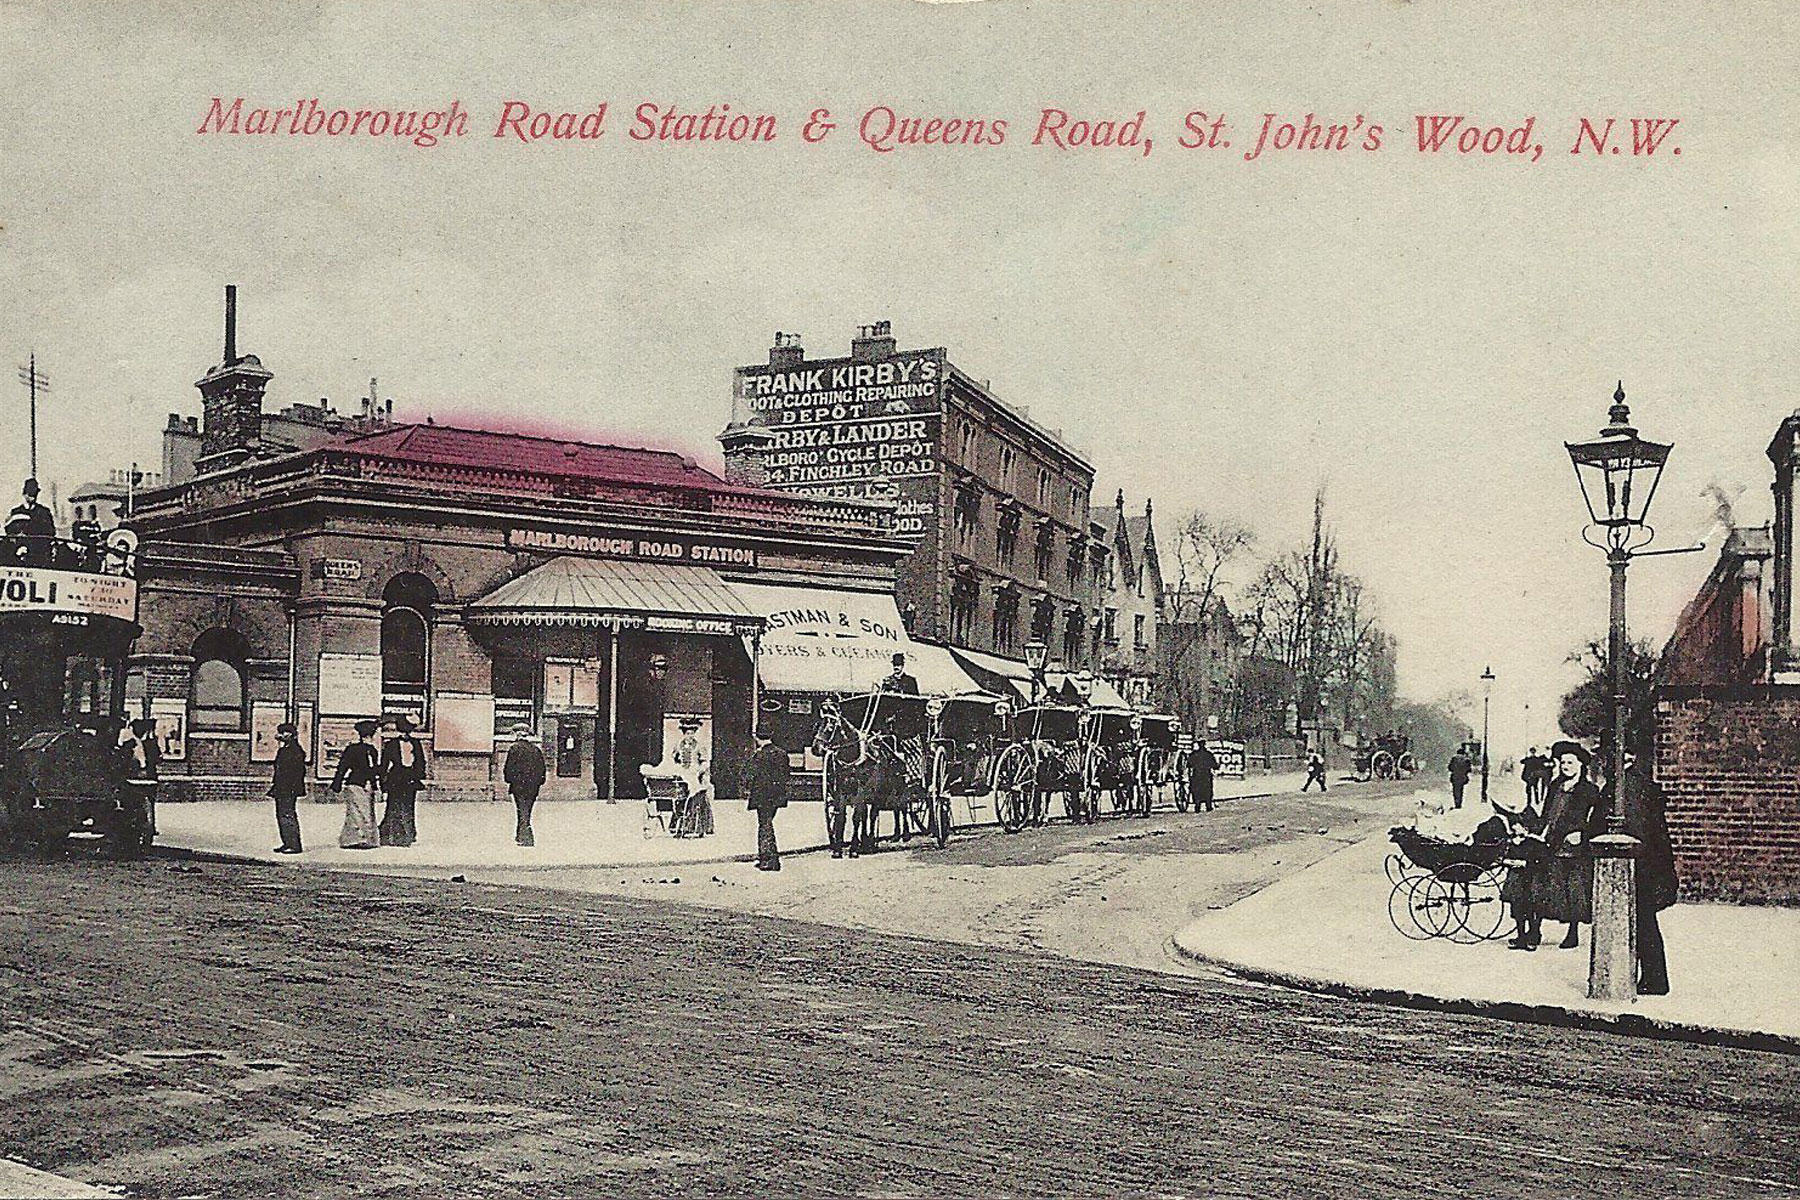 Marlborough Road